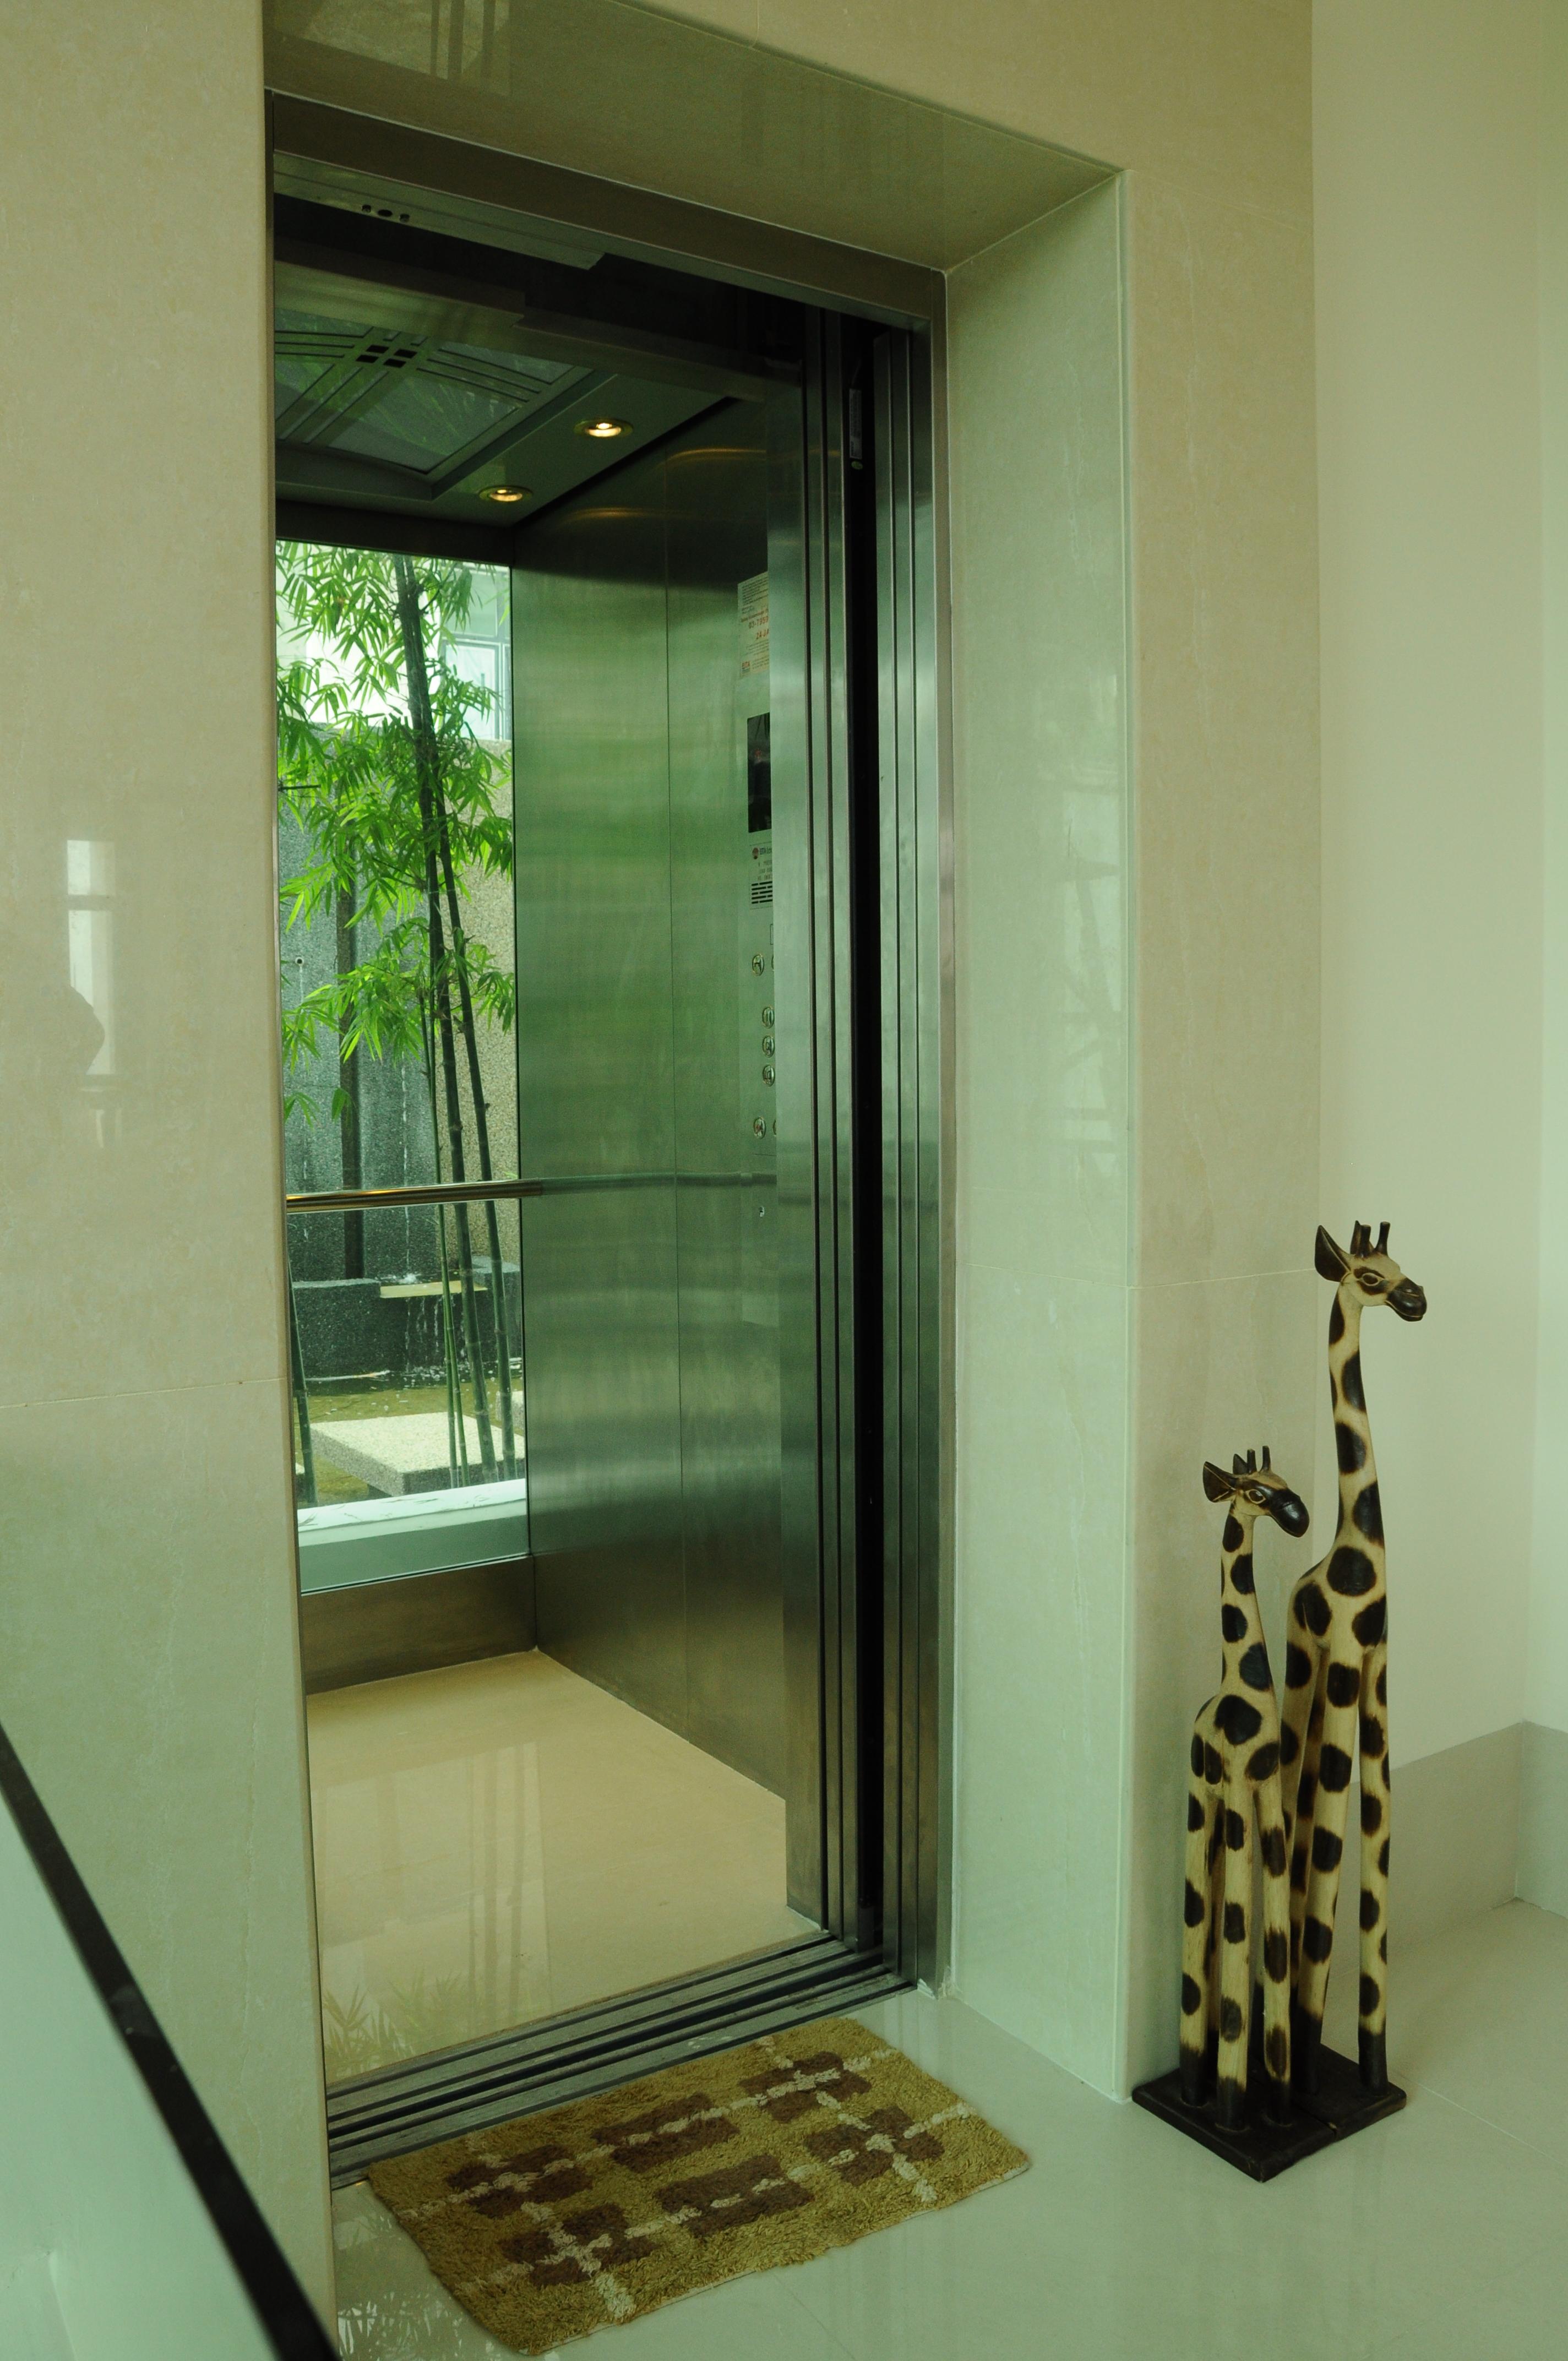 Khoo S Bungalow Kuala Lumpur Malaysia Eita Elevator